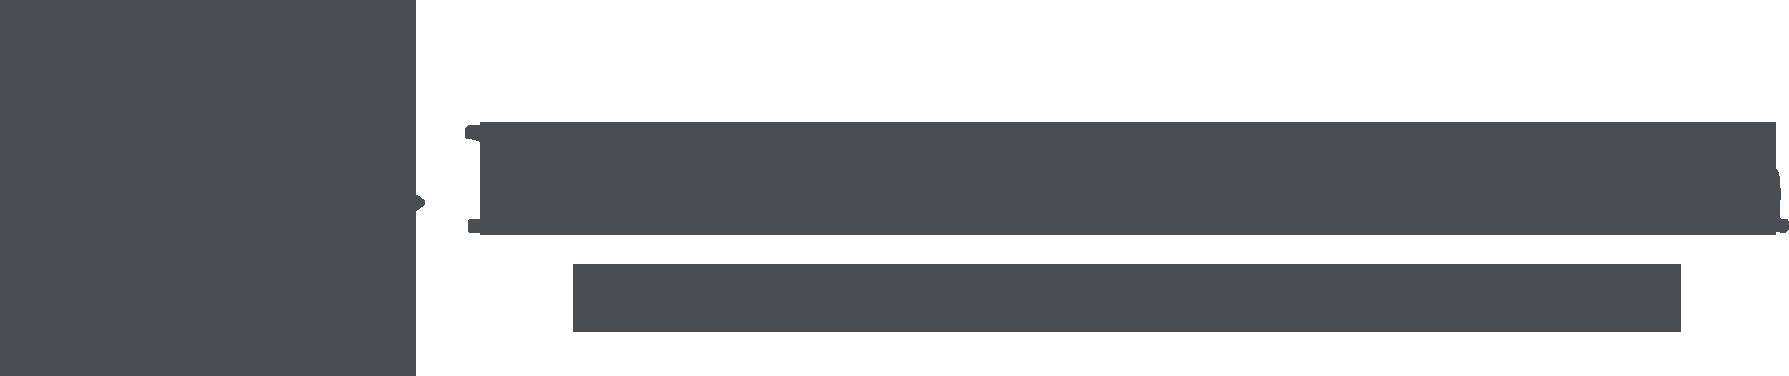 Nine Mile Station Senior Living